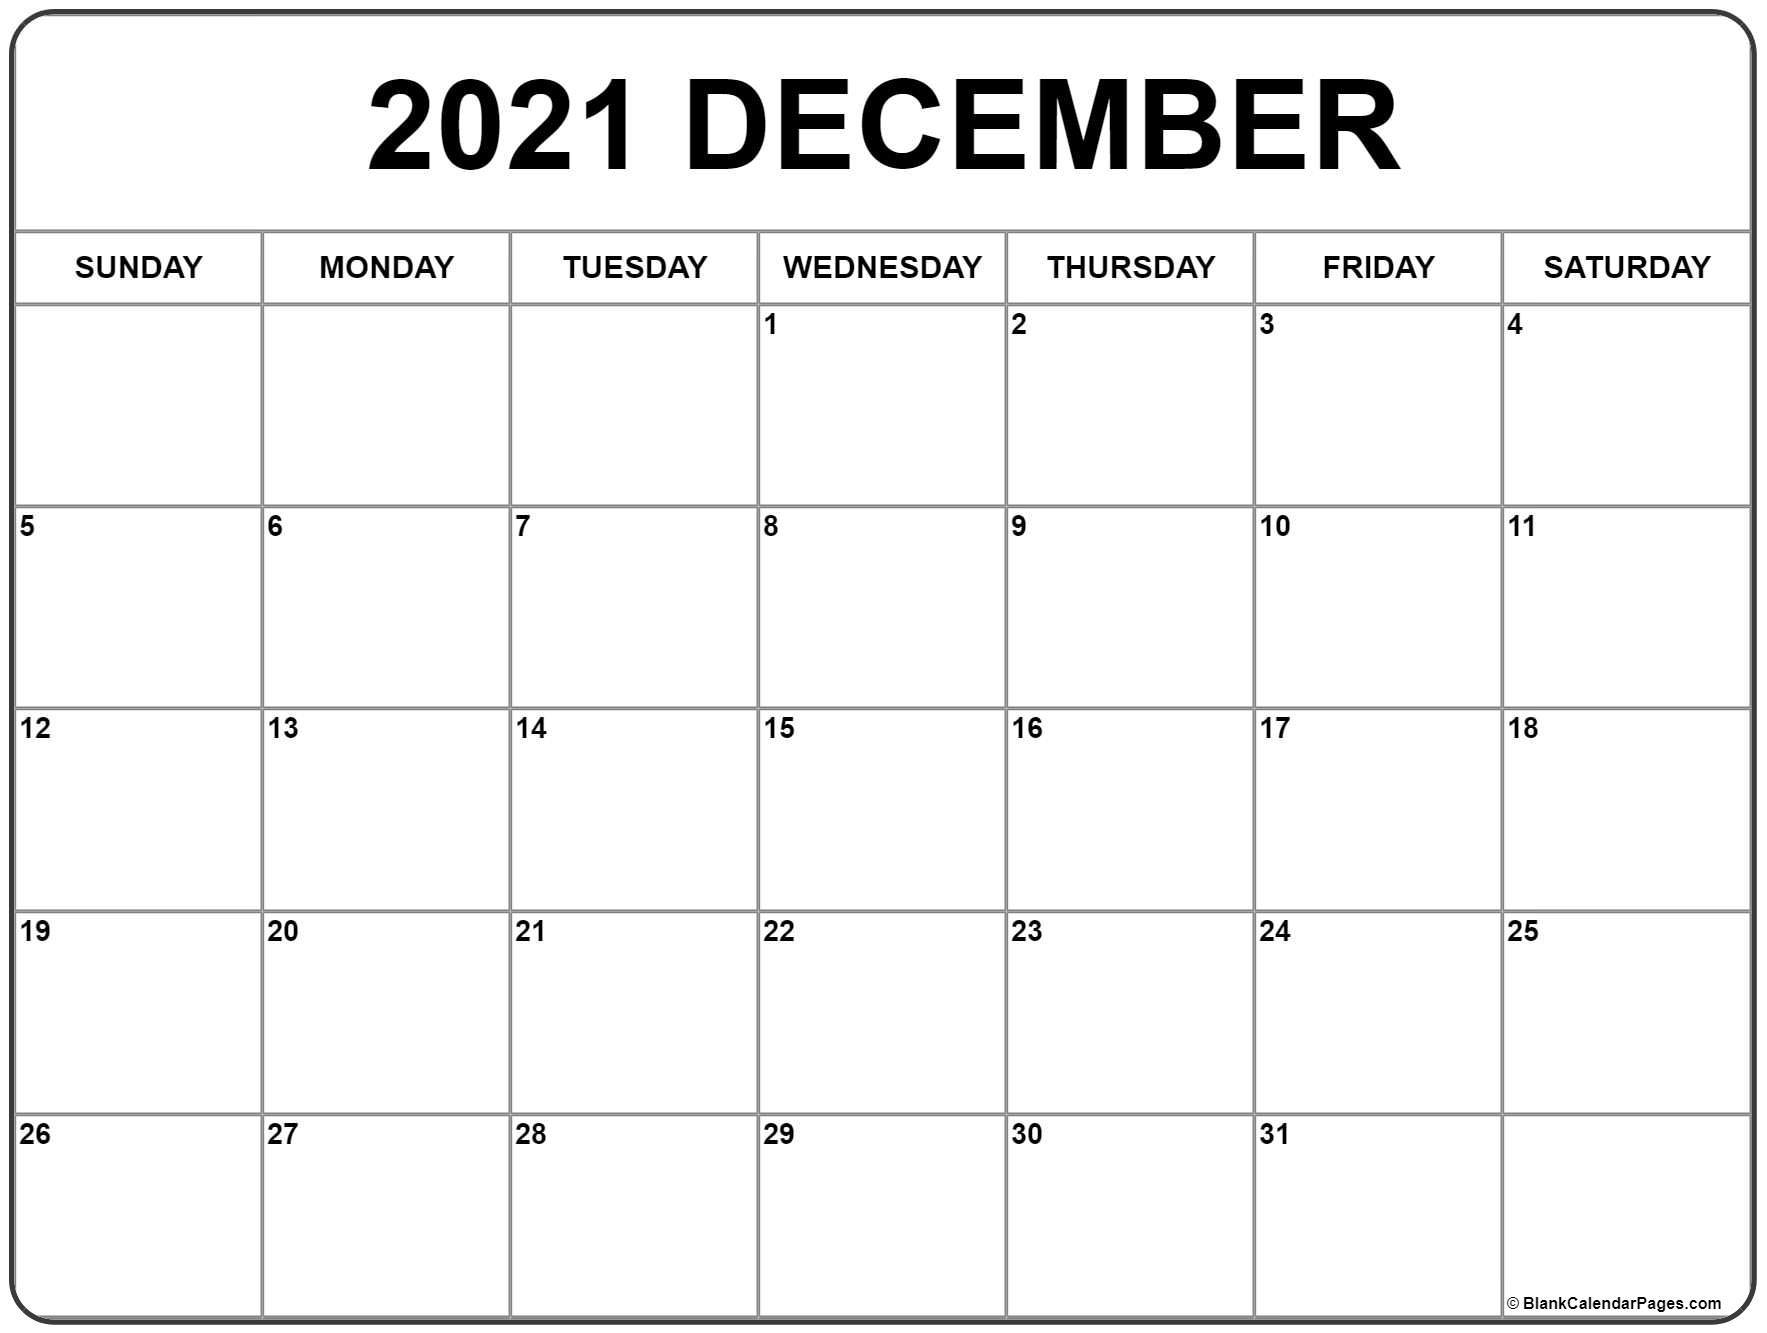 December 2021 Calendar | Free Printable Monthly Calendars  Calendar October November December 2021